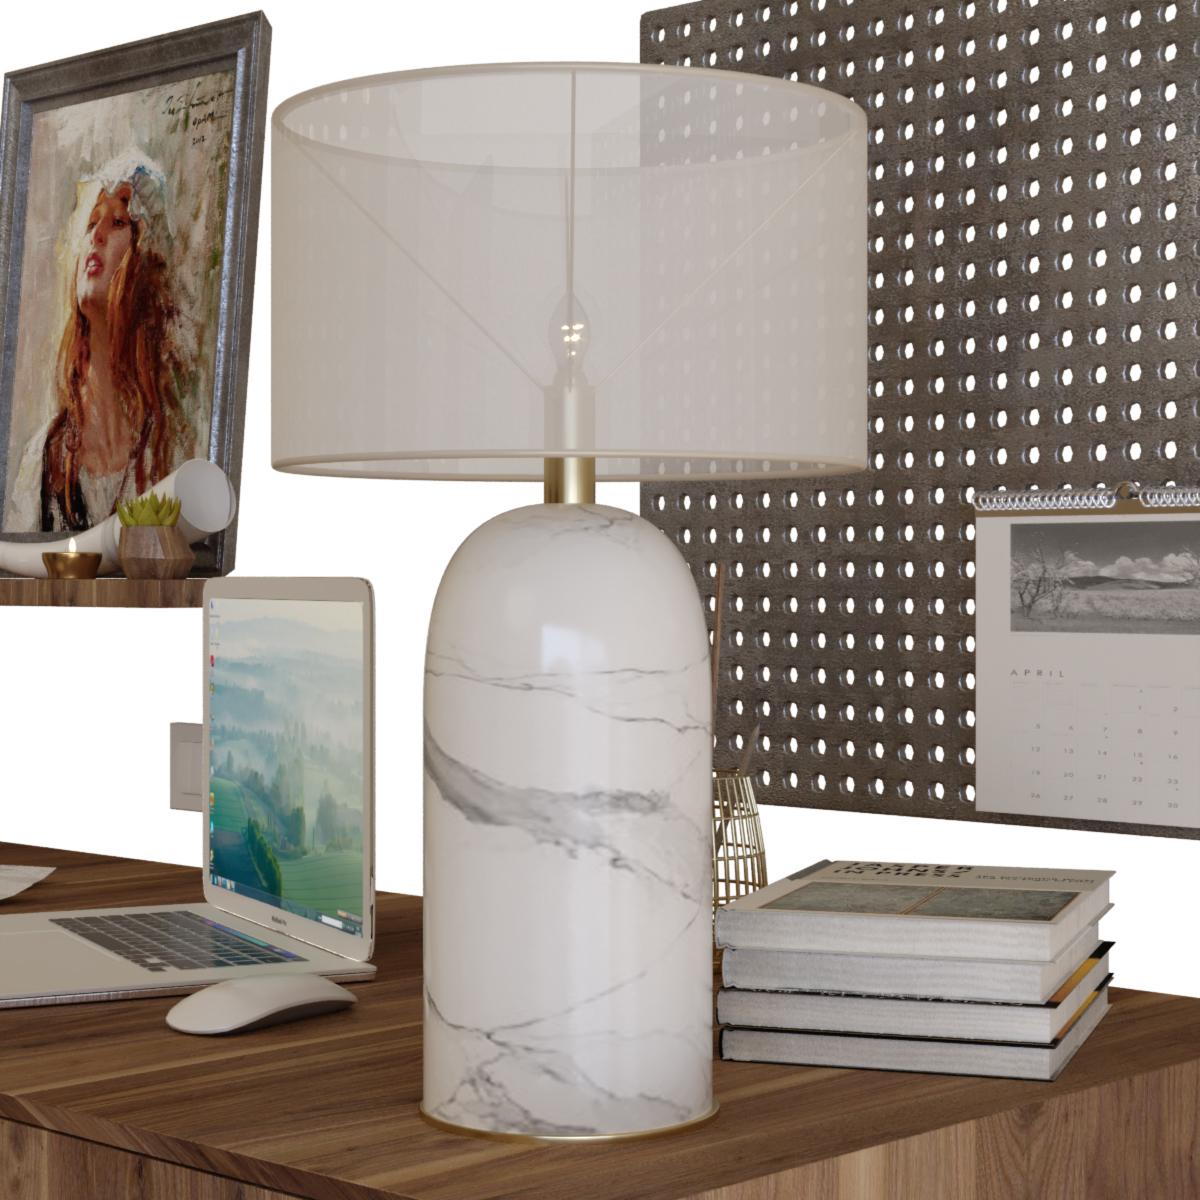 2.jpg Download STL file work table 3 • 3D printer design, unisjamavari